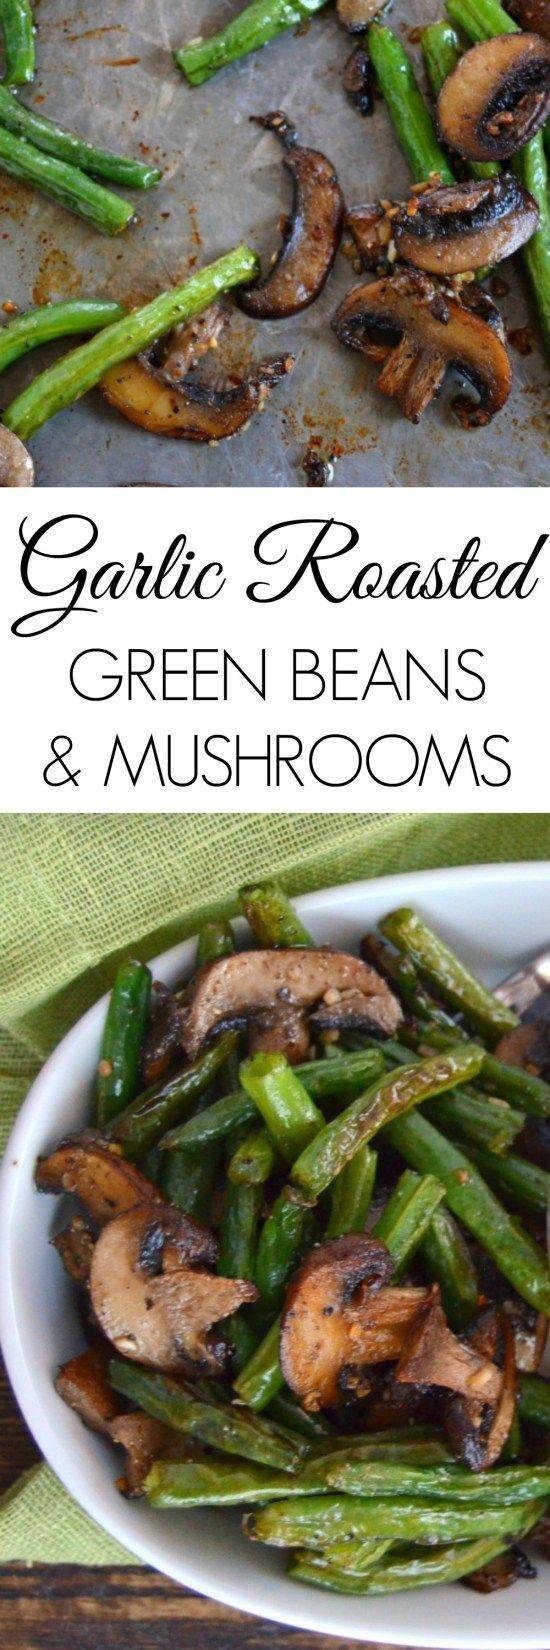 Garlic Roasted Green Beans and Mushrooms Vegetable Side Dish Recipe via Kate Moving Forward - Healthy Side Dish - Roasted Vegetables - Roasted Vegetables Oven - Roasted Vegetables Recipe - Roasted Vegetables Healthy